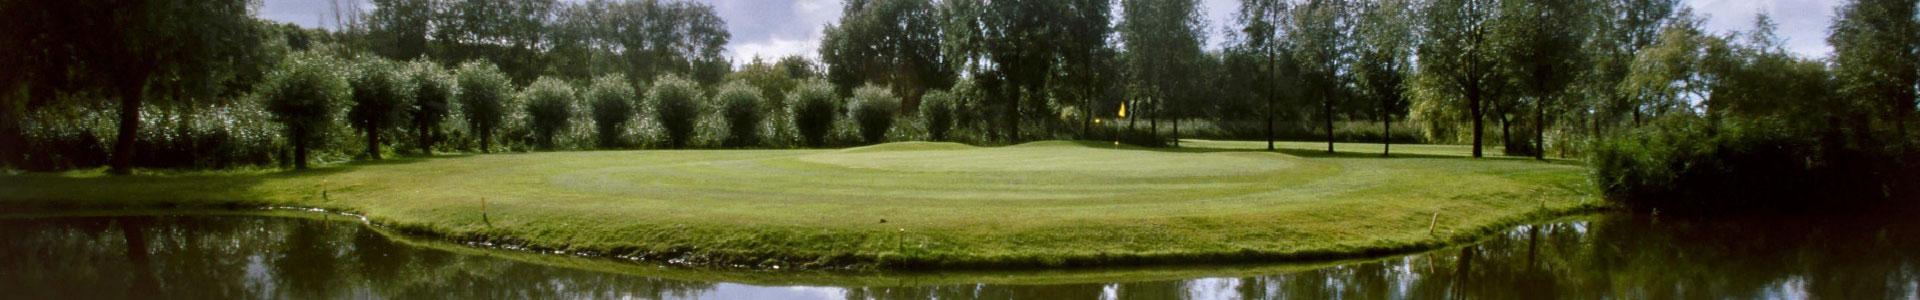 Hole 15 Golfclub Broekpolder